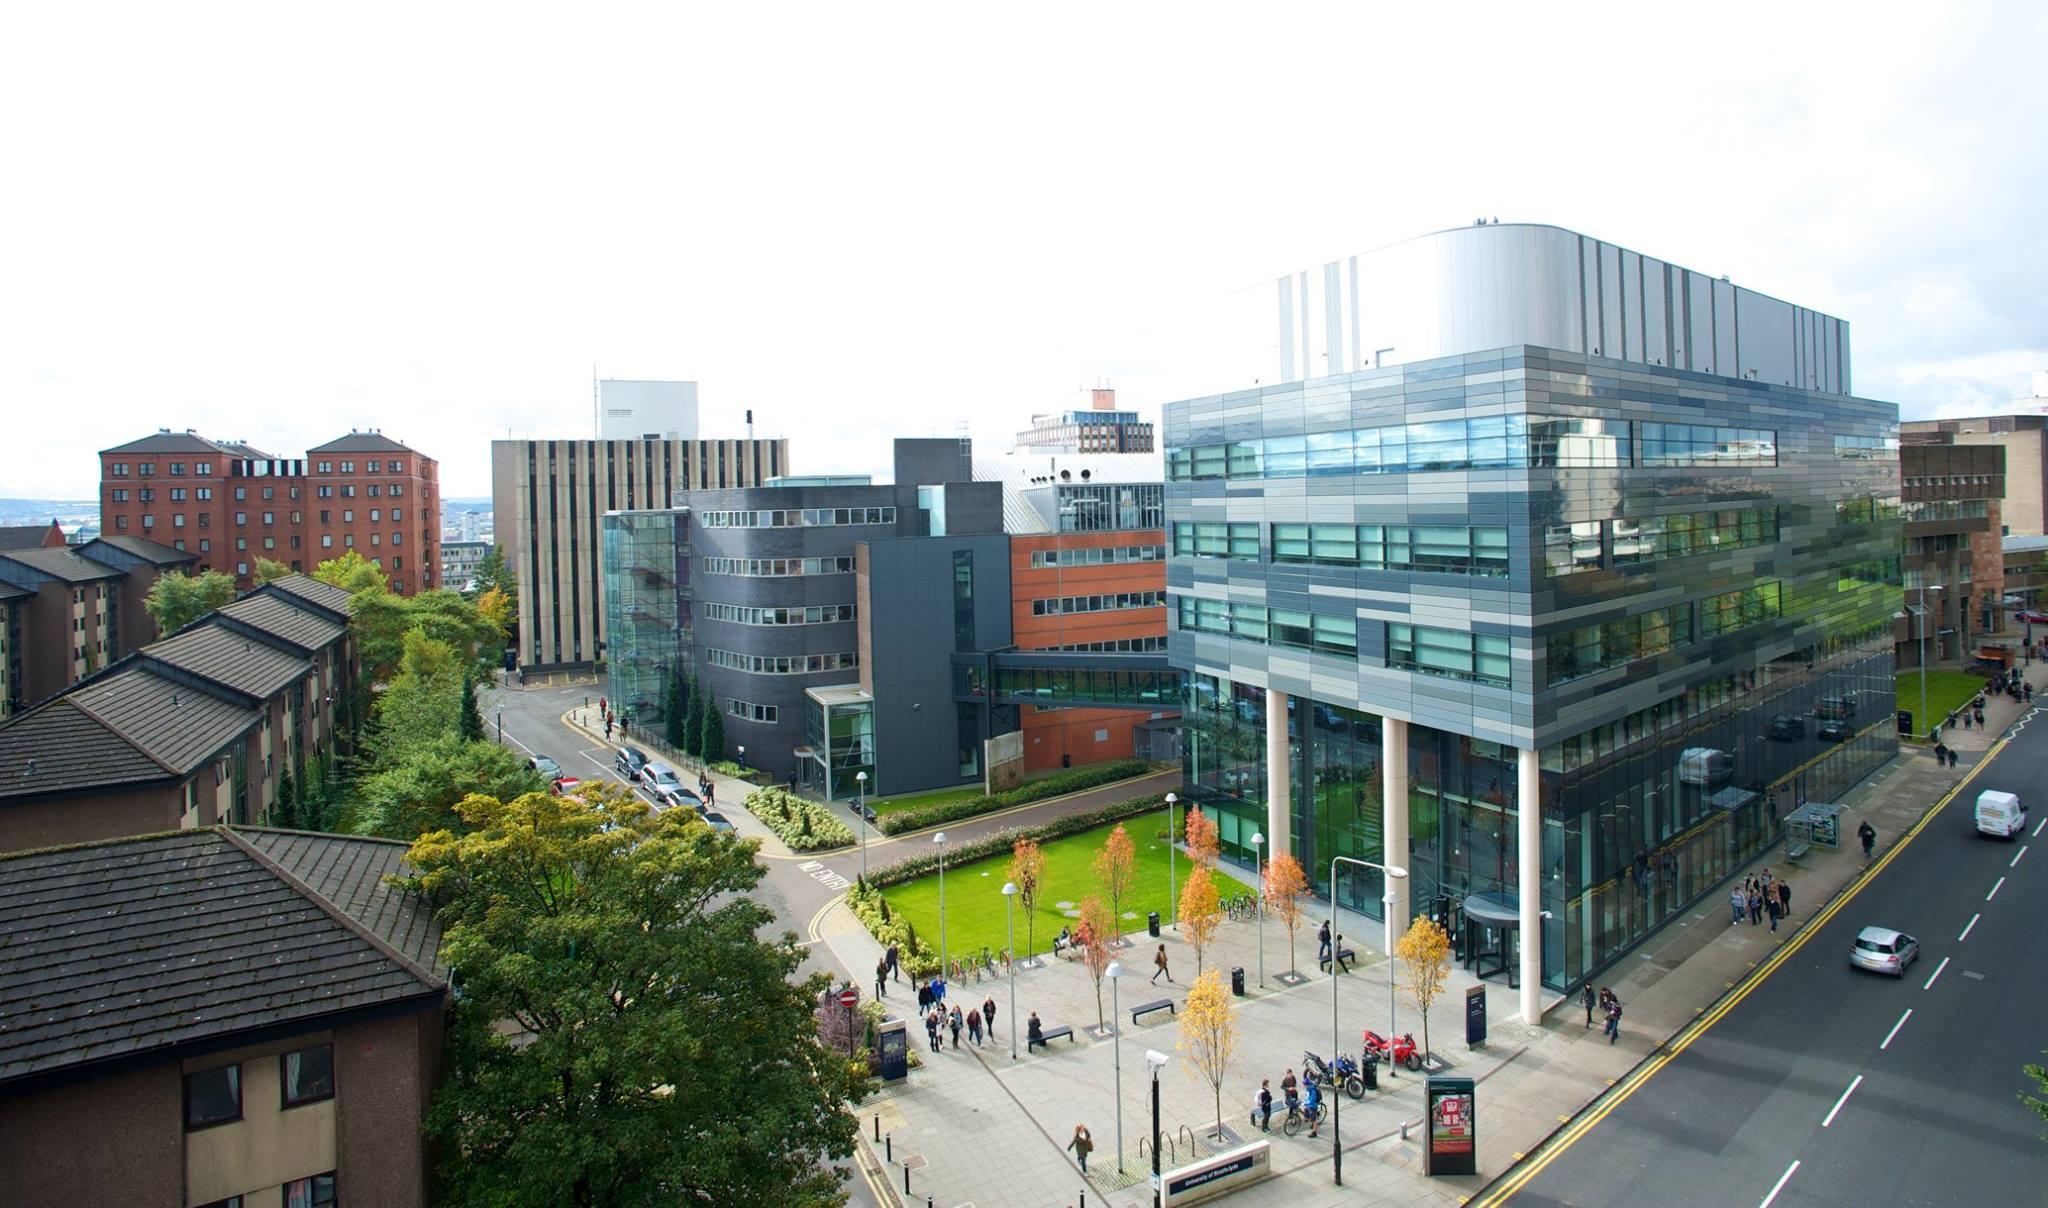 Strathclyde Business School Campus